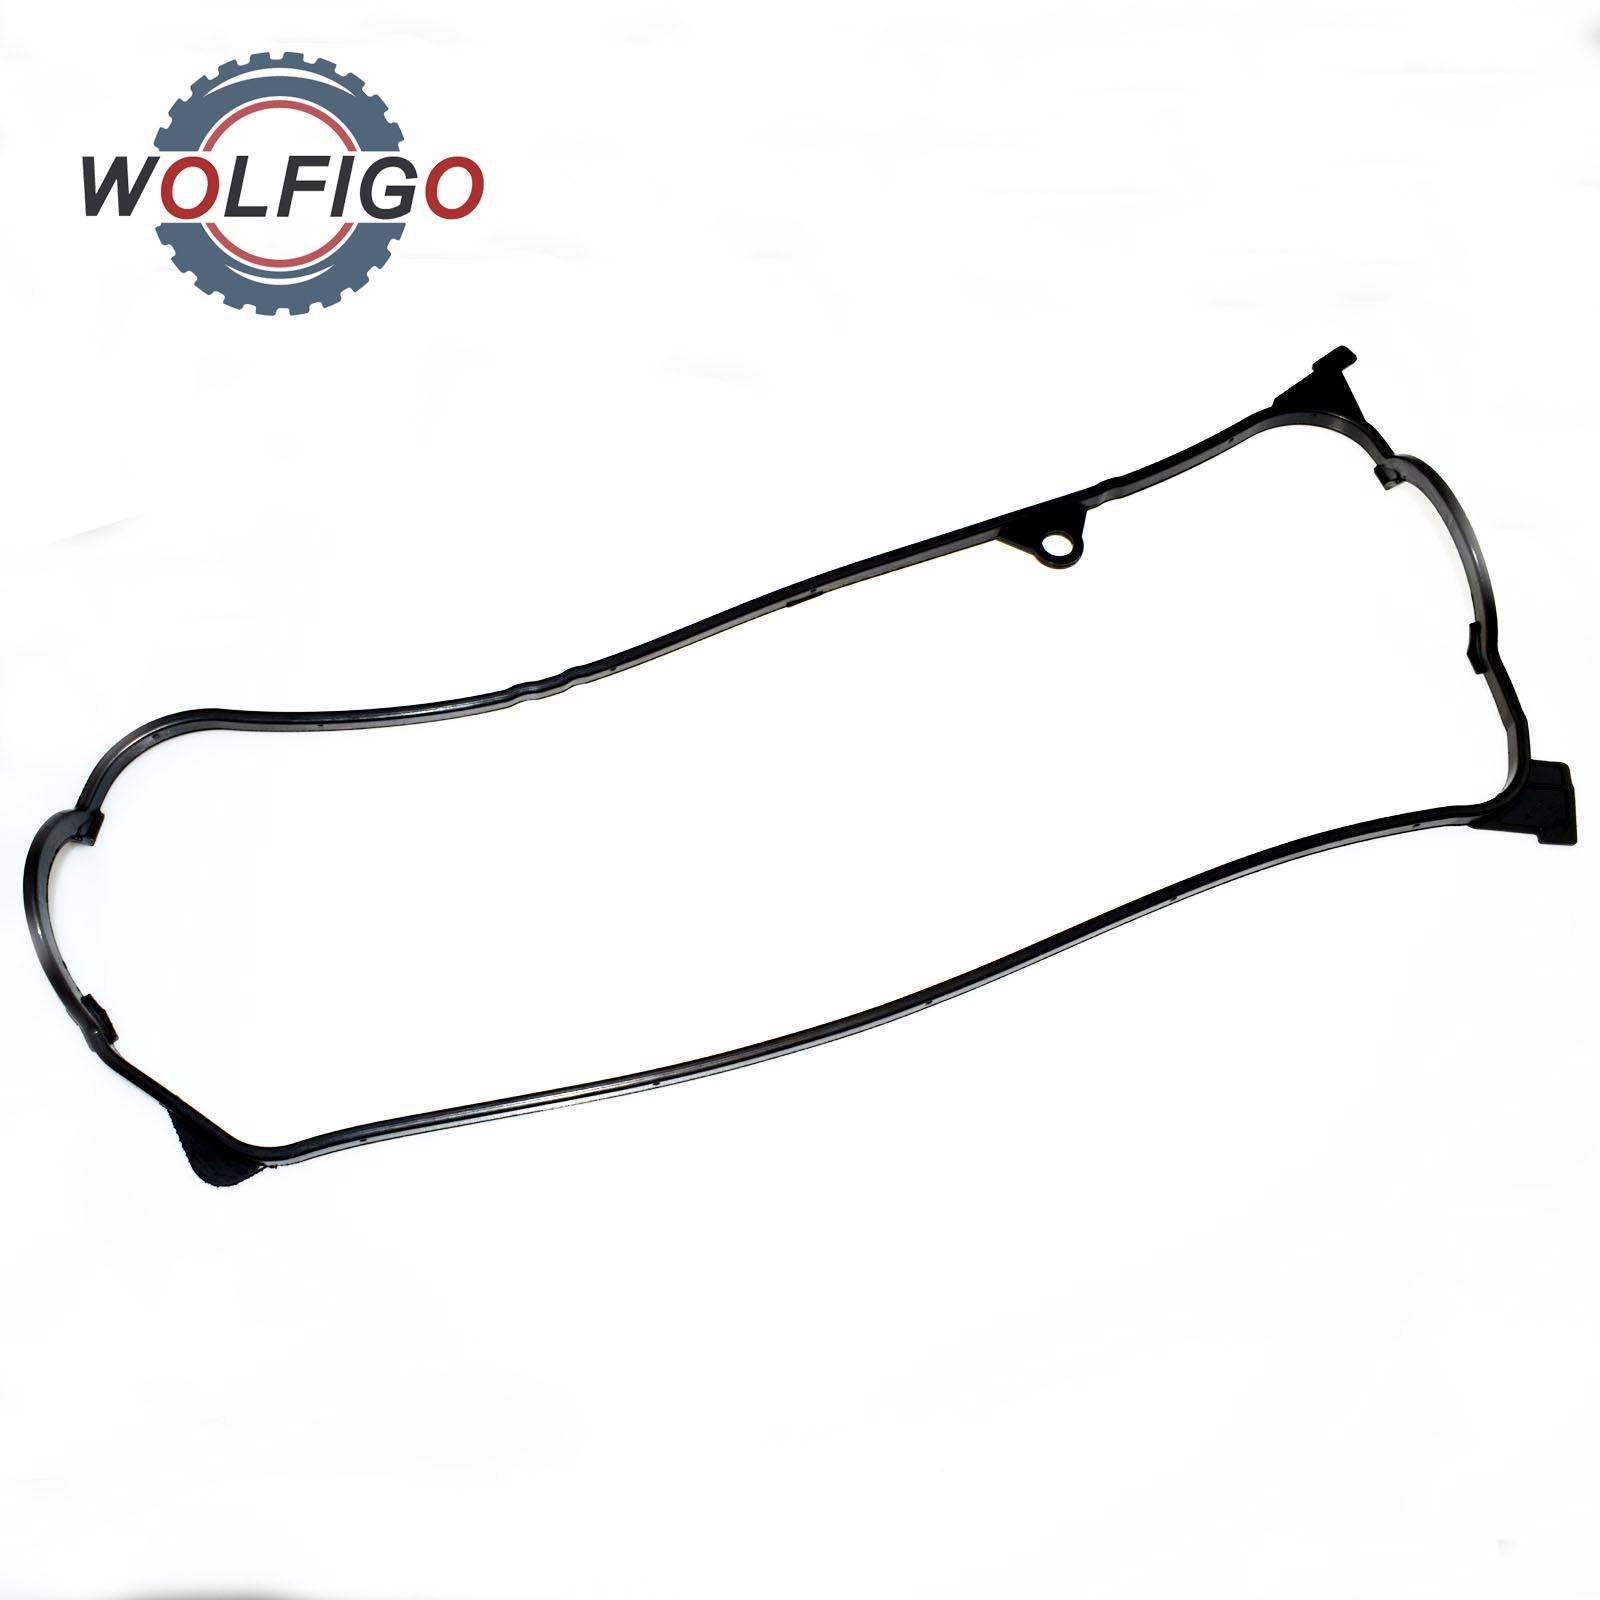 Aliexpress Buy Wolfigo New Engine Valve Cover Gasket For Honda Civic 1 7l 4cyl Sohc